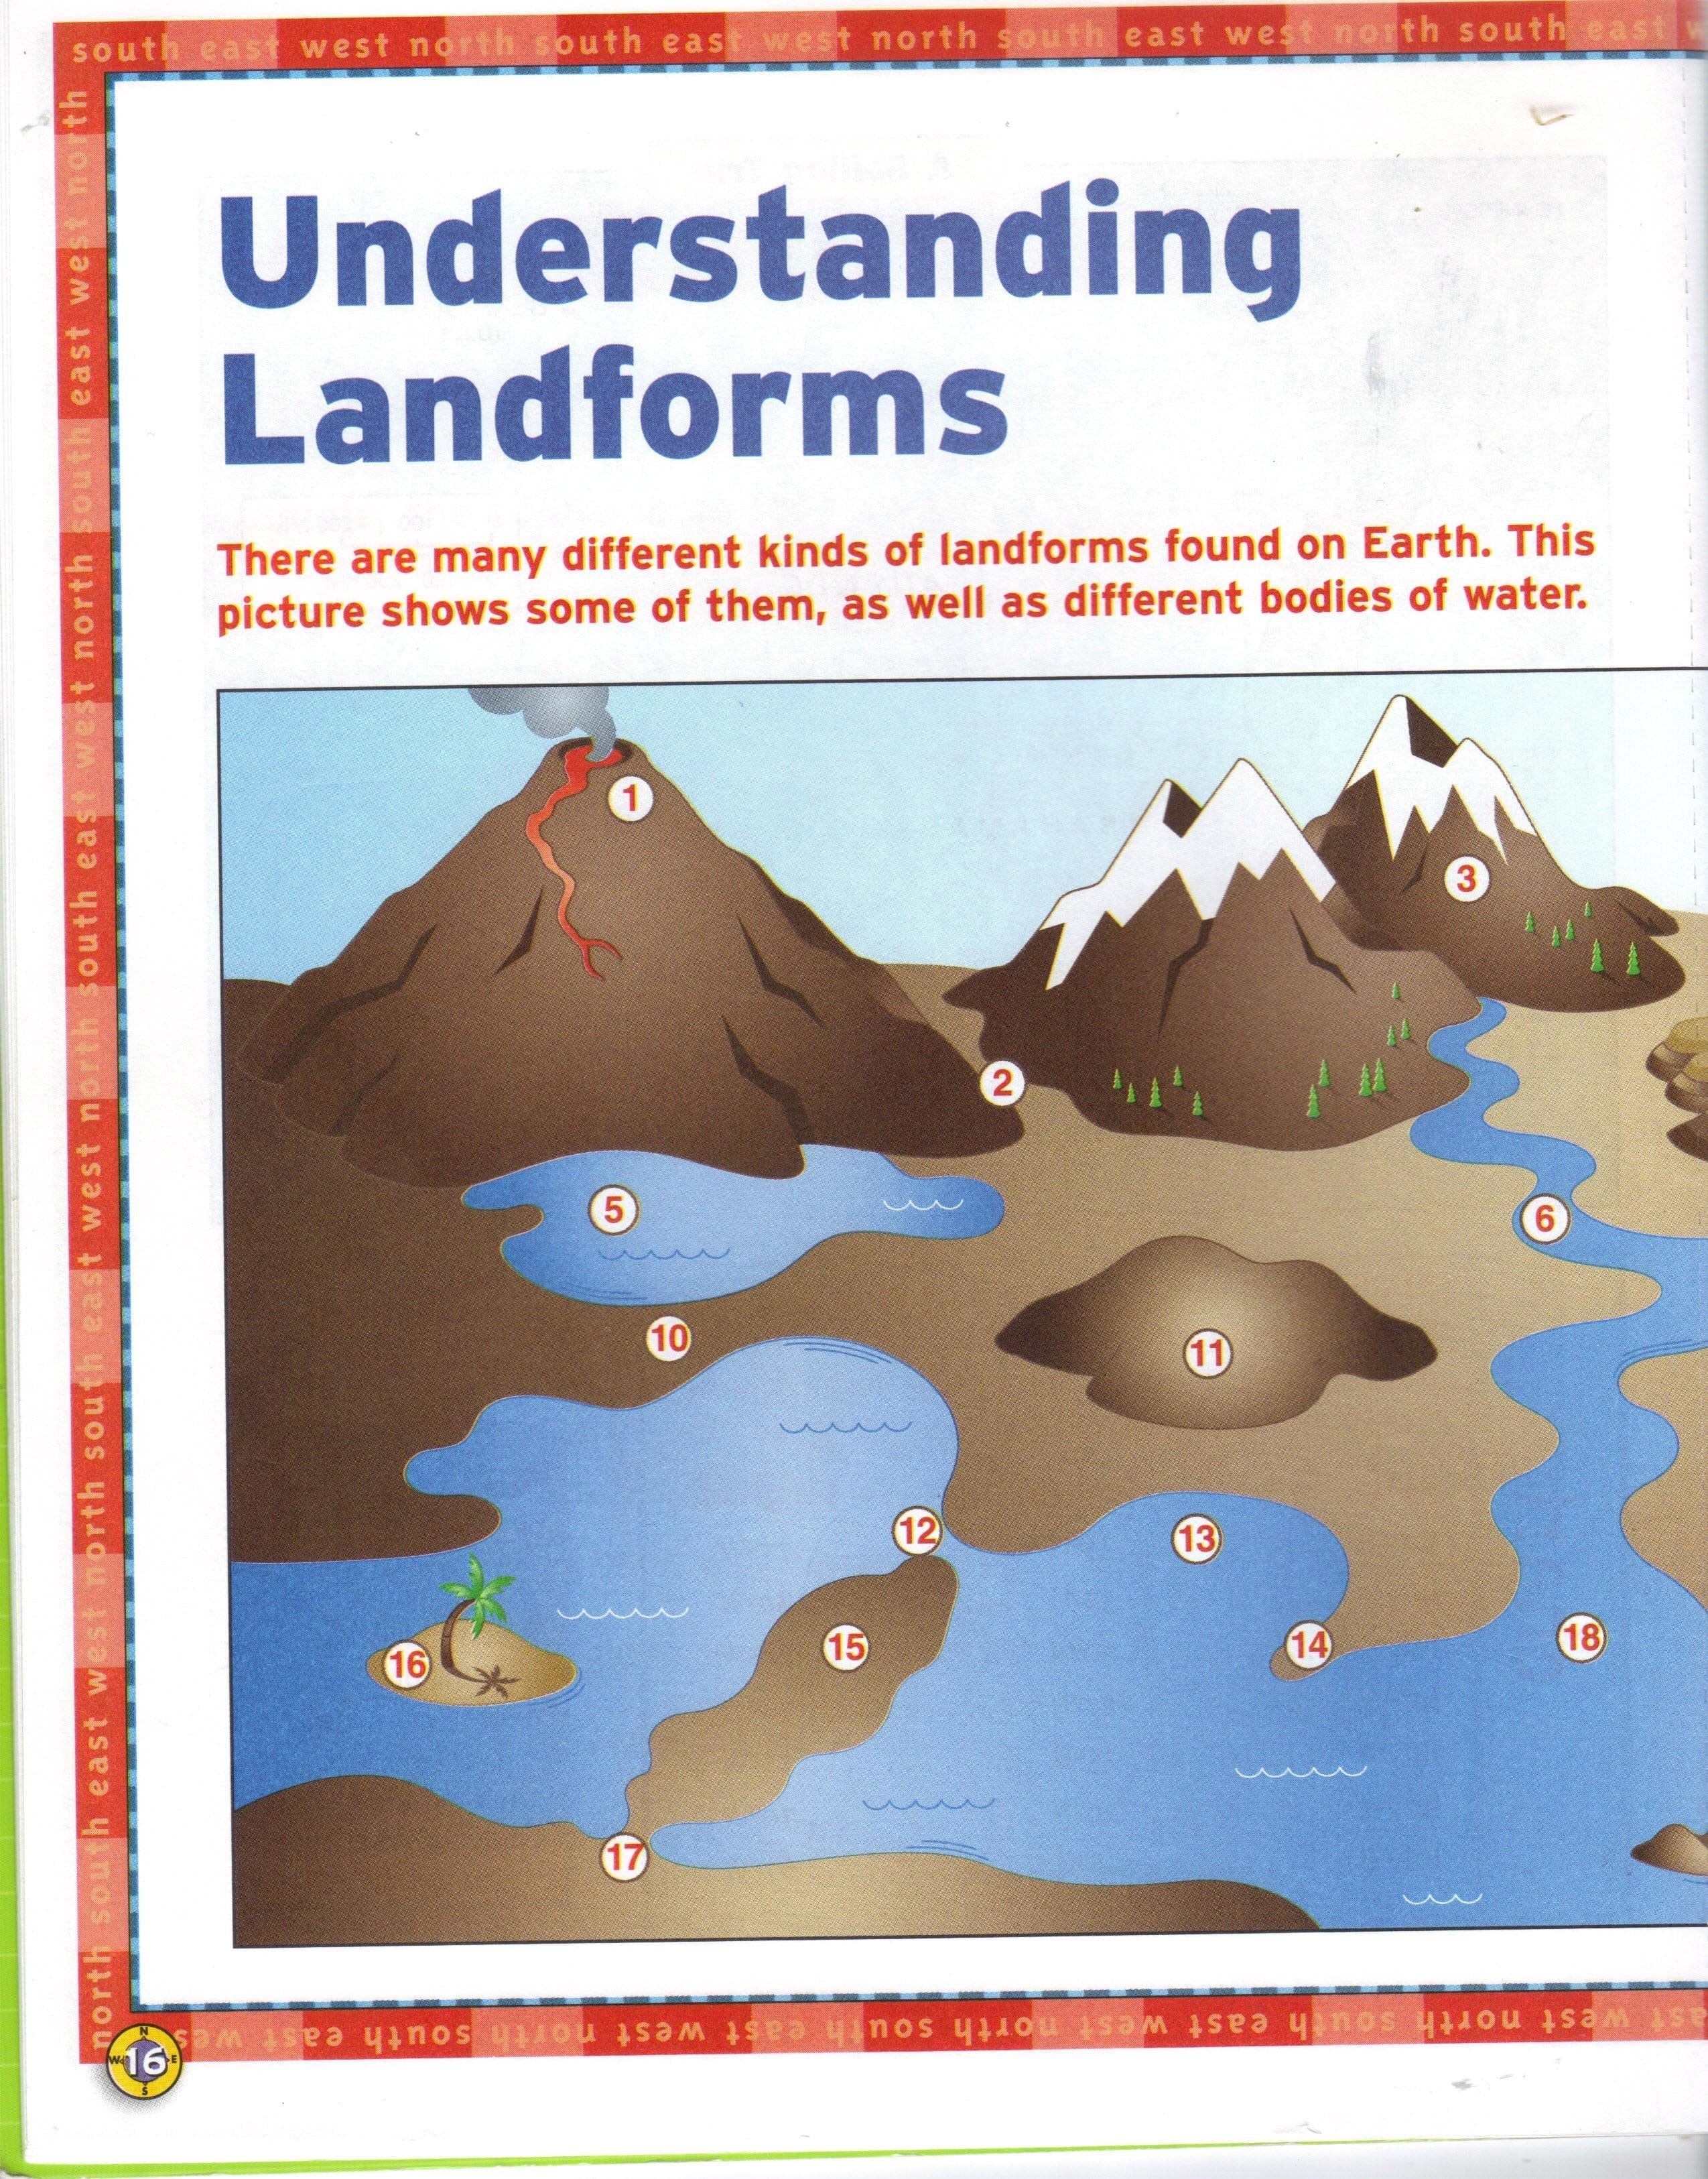 Free Printable Landforms Worksheets The Best Worksheets Image Pertaining To Free Printable Landform Worksheets